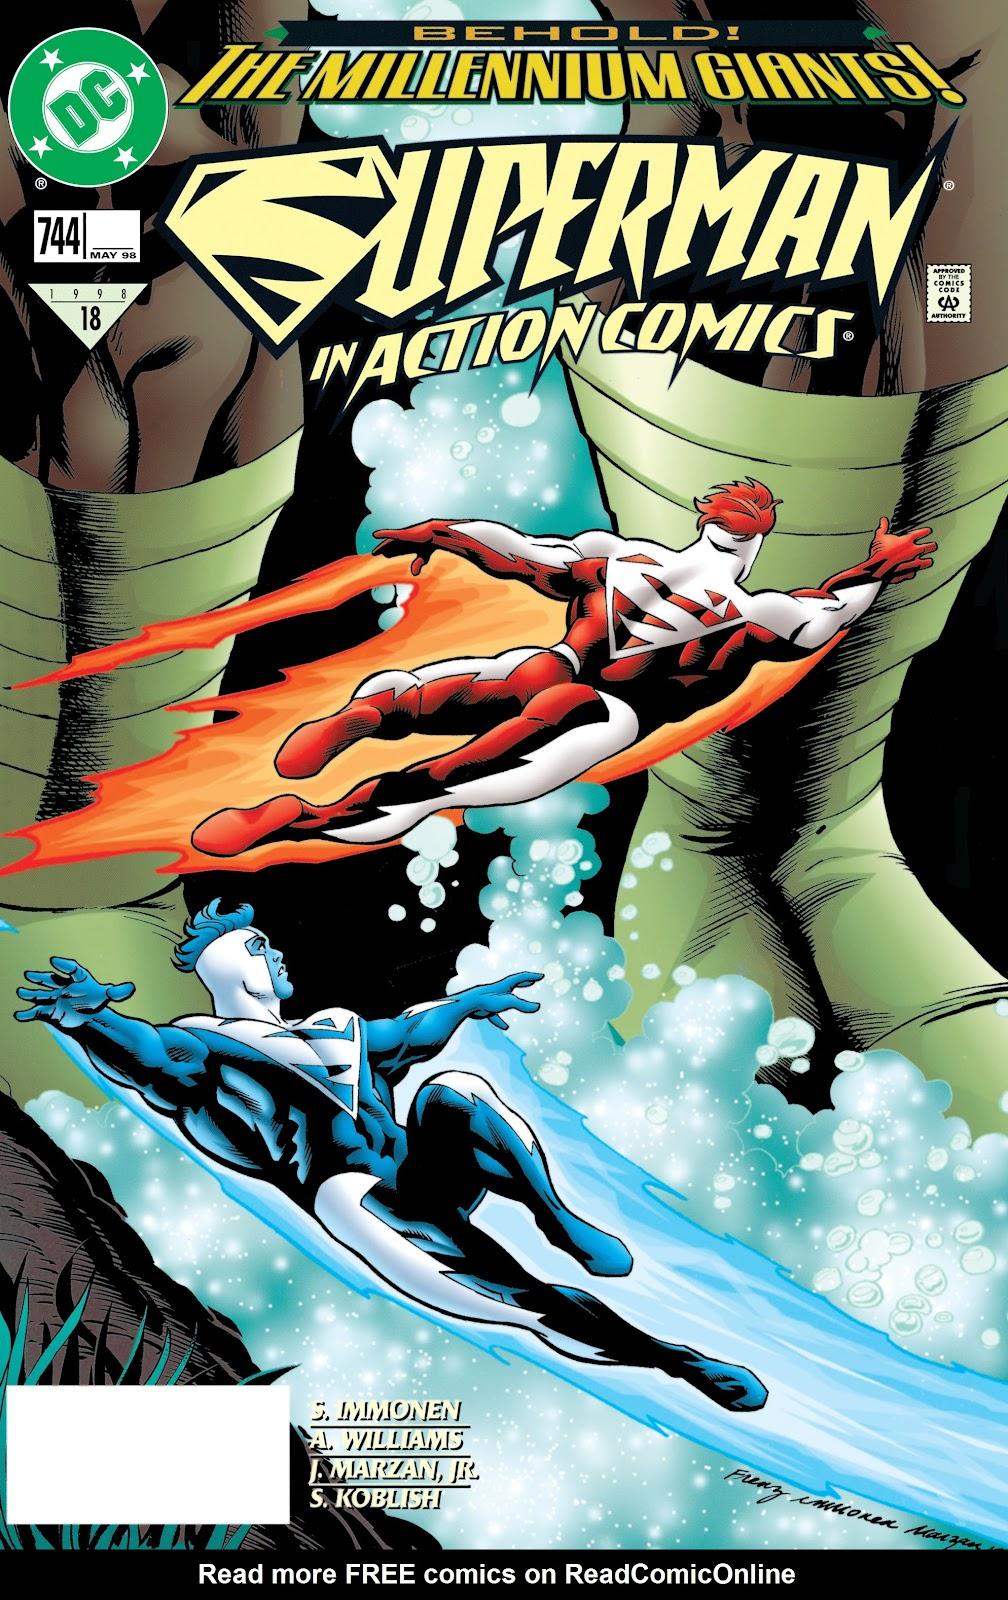 Action Comics (1938) 744 Page 1